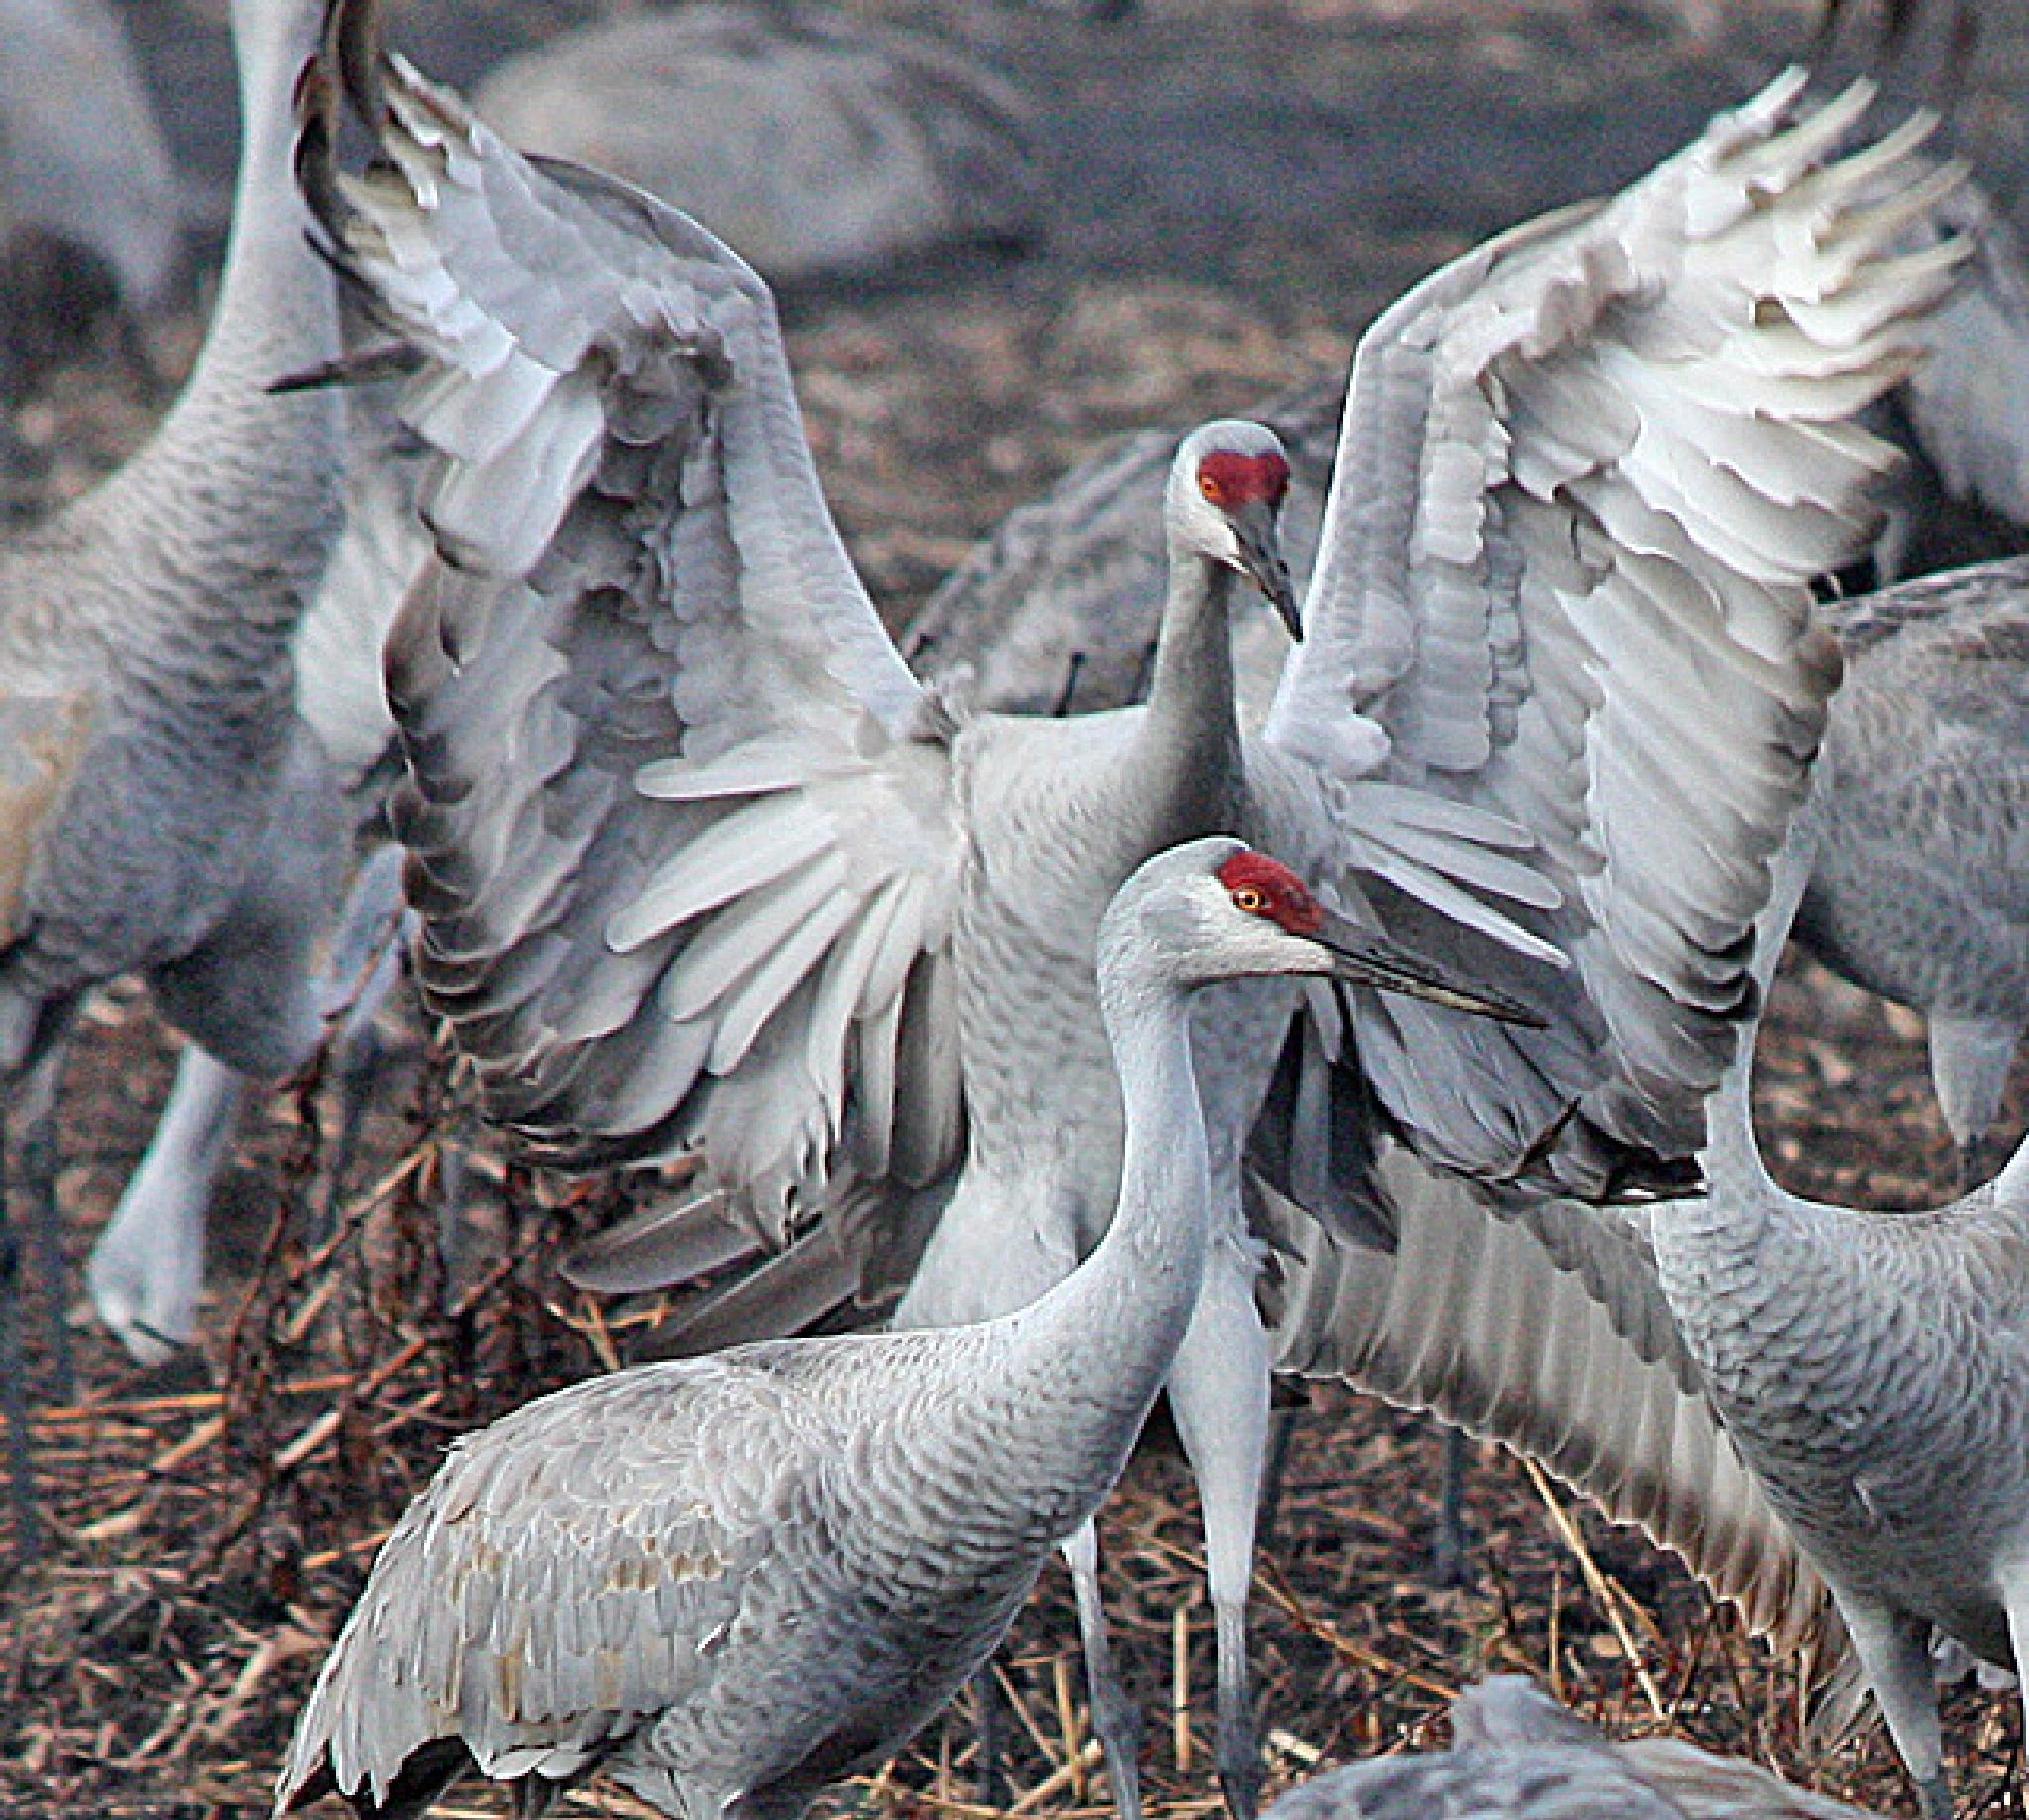 Spreading My Wings by FarolsFotos